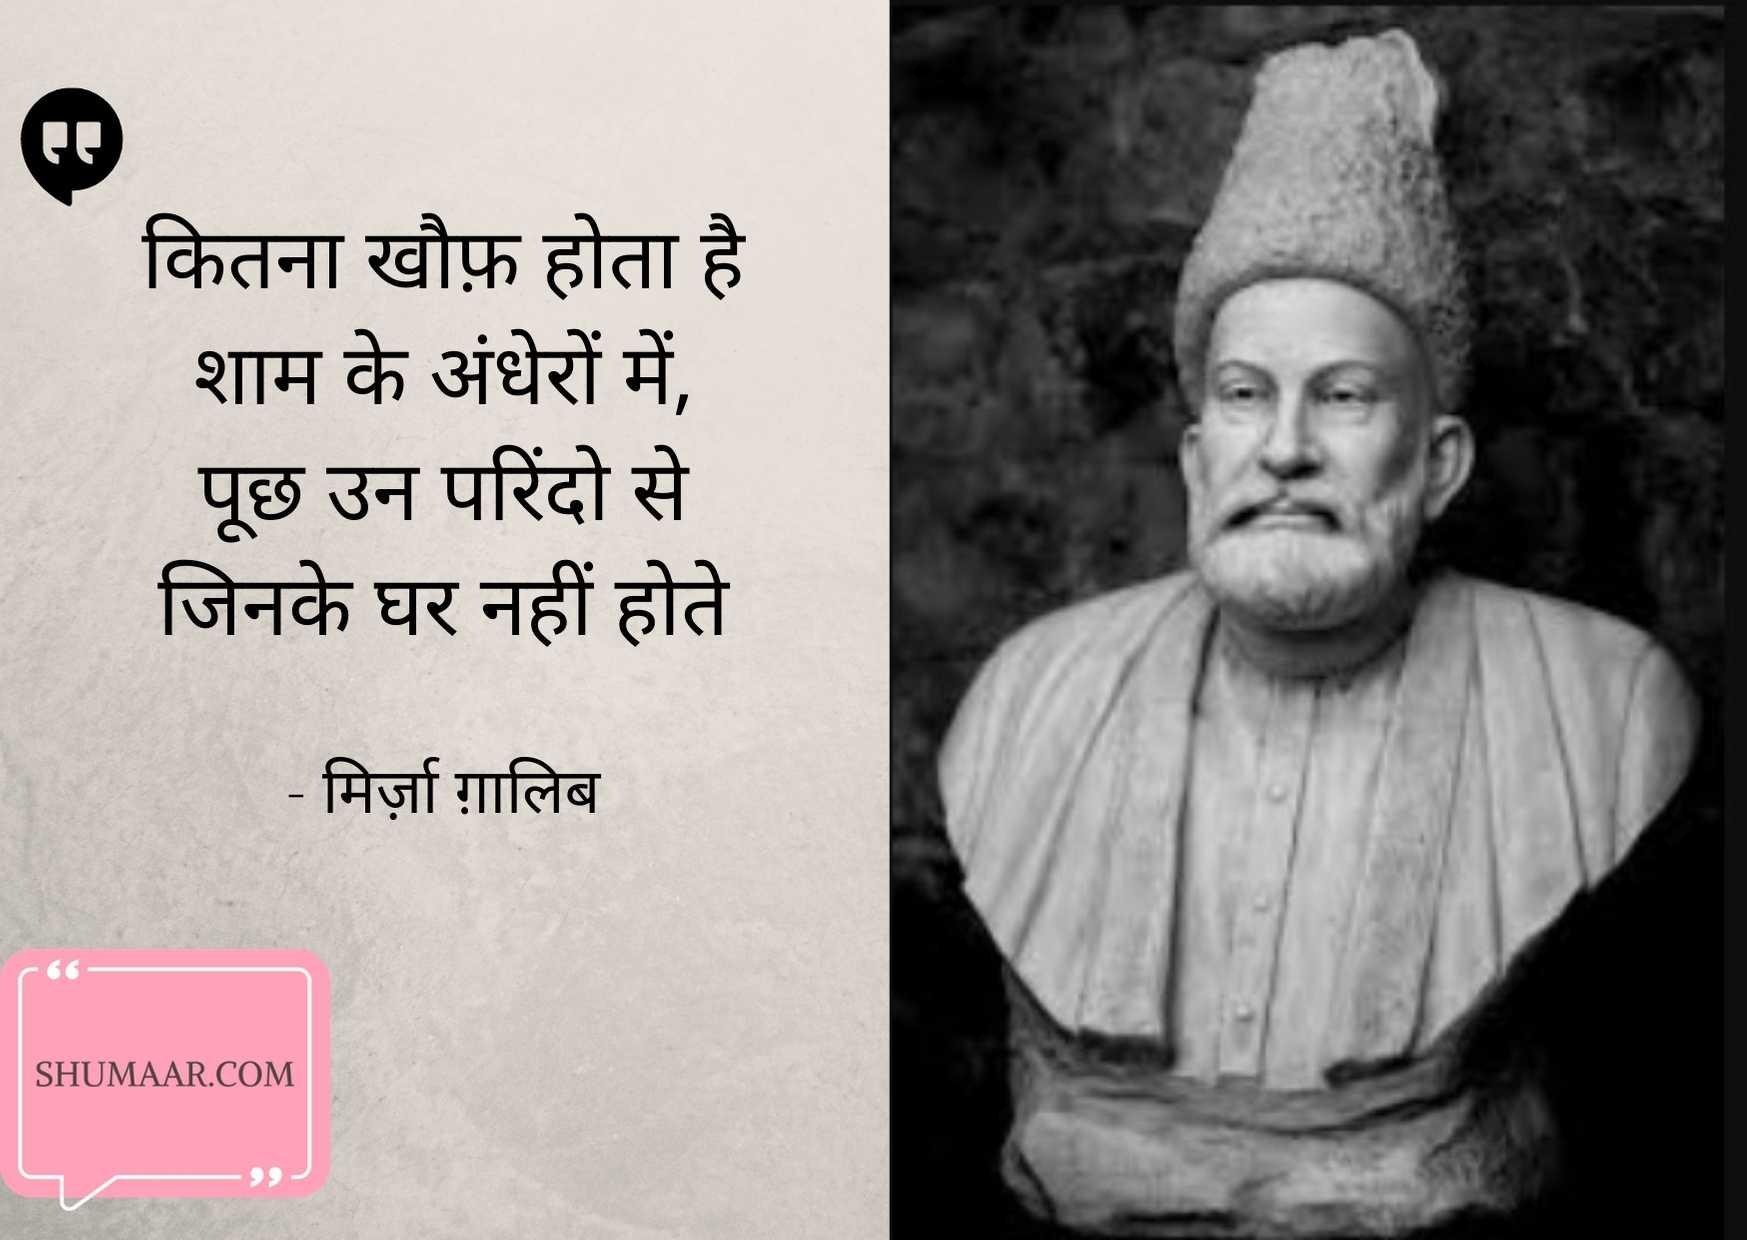 ghalib shayari ghalib poetry mirza ghalib poetry